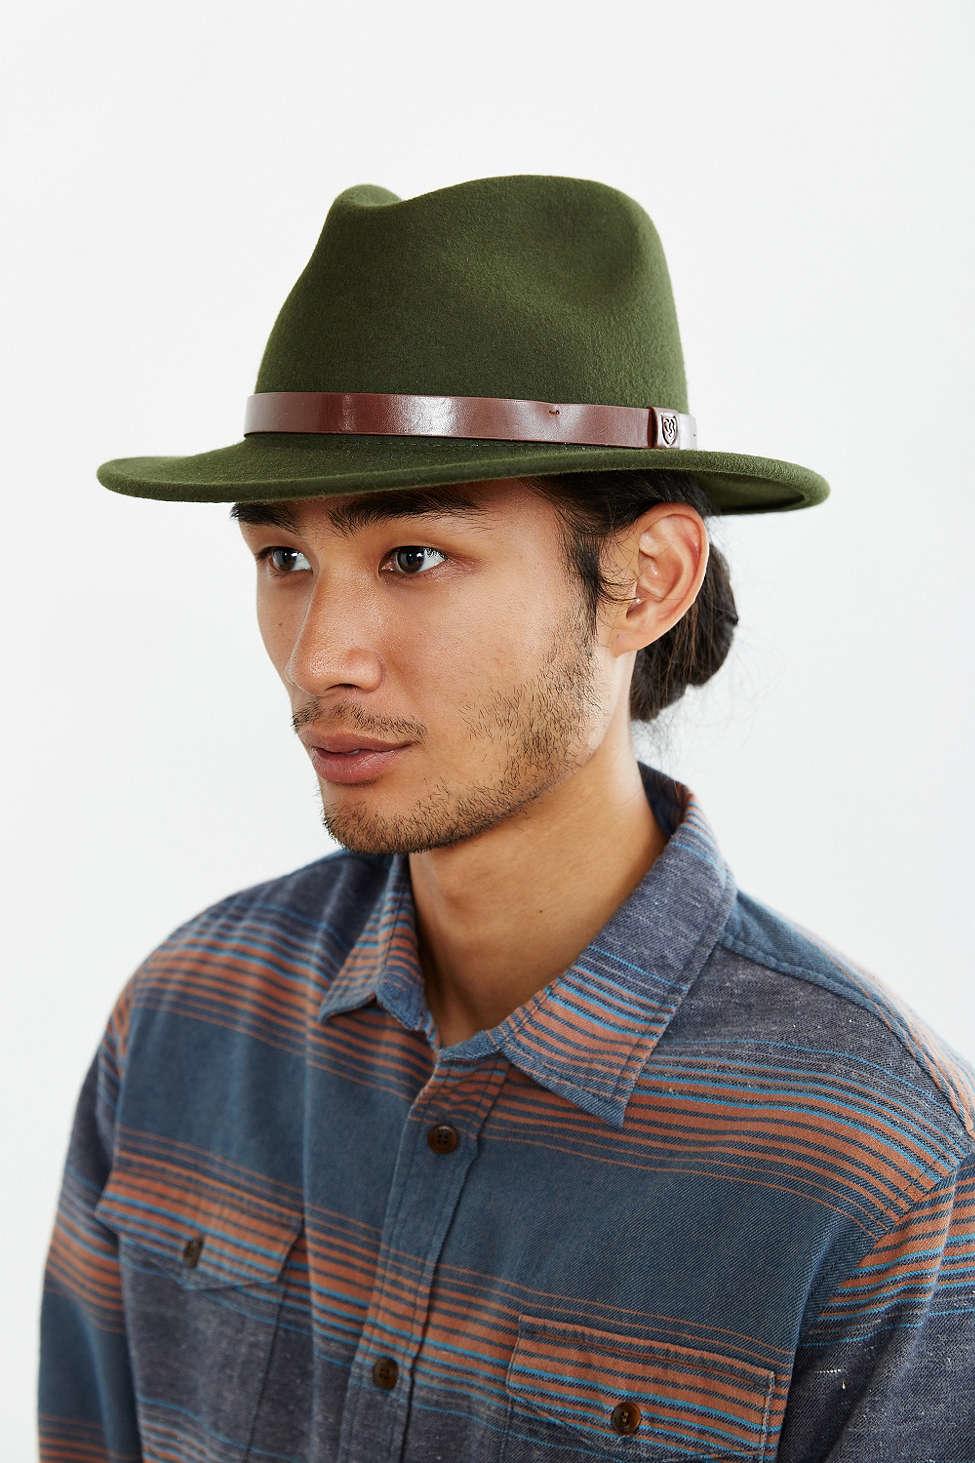 d82ac18349e Lyst - Brixton Messer Fedora Hat in Green for Men